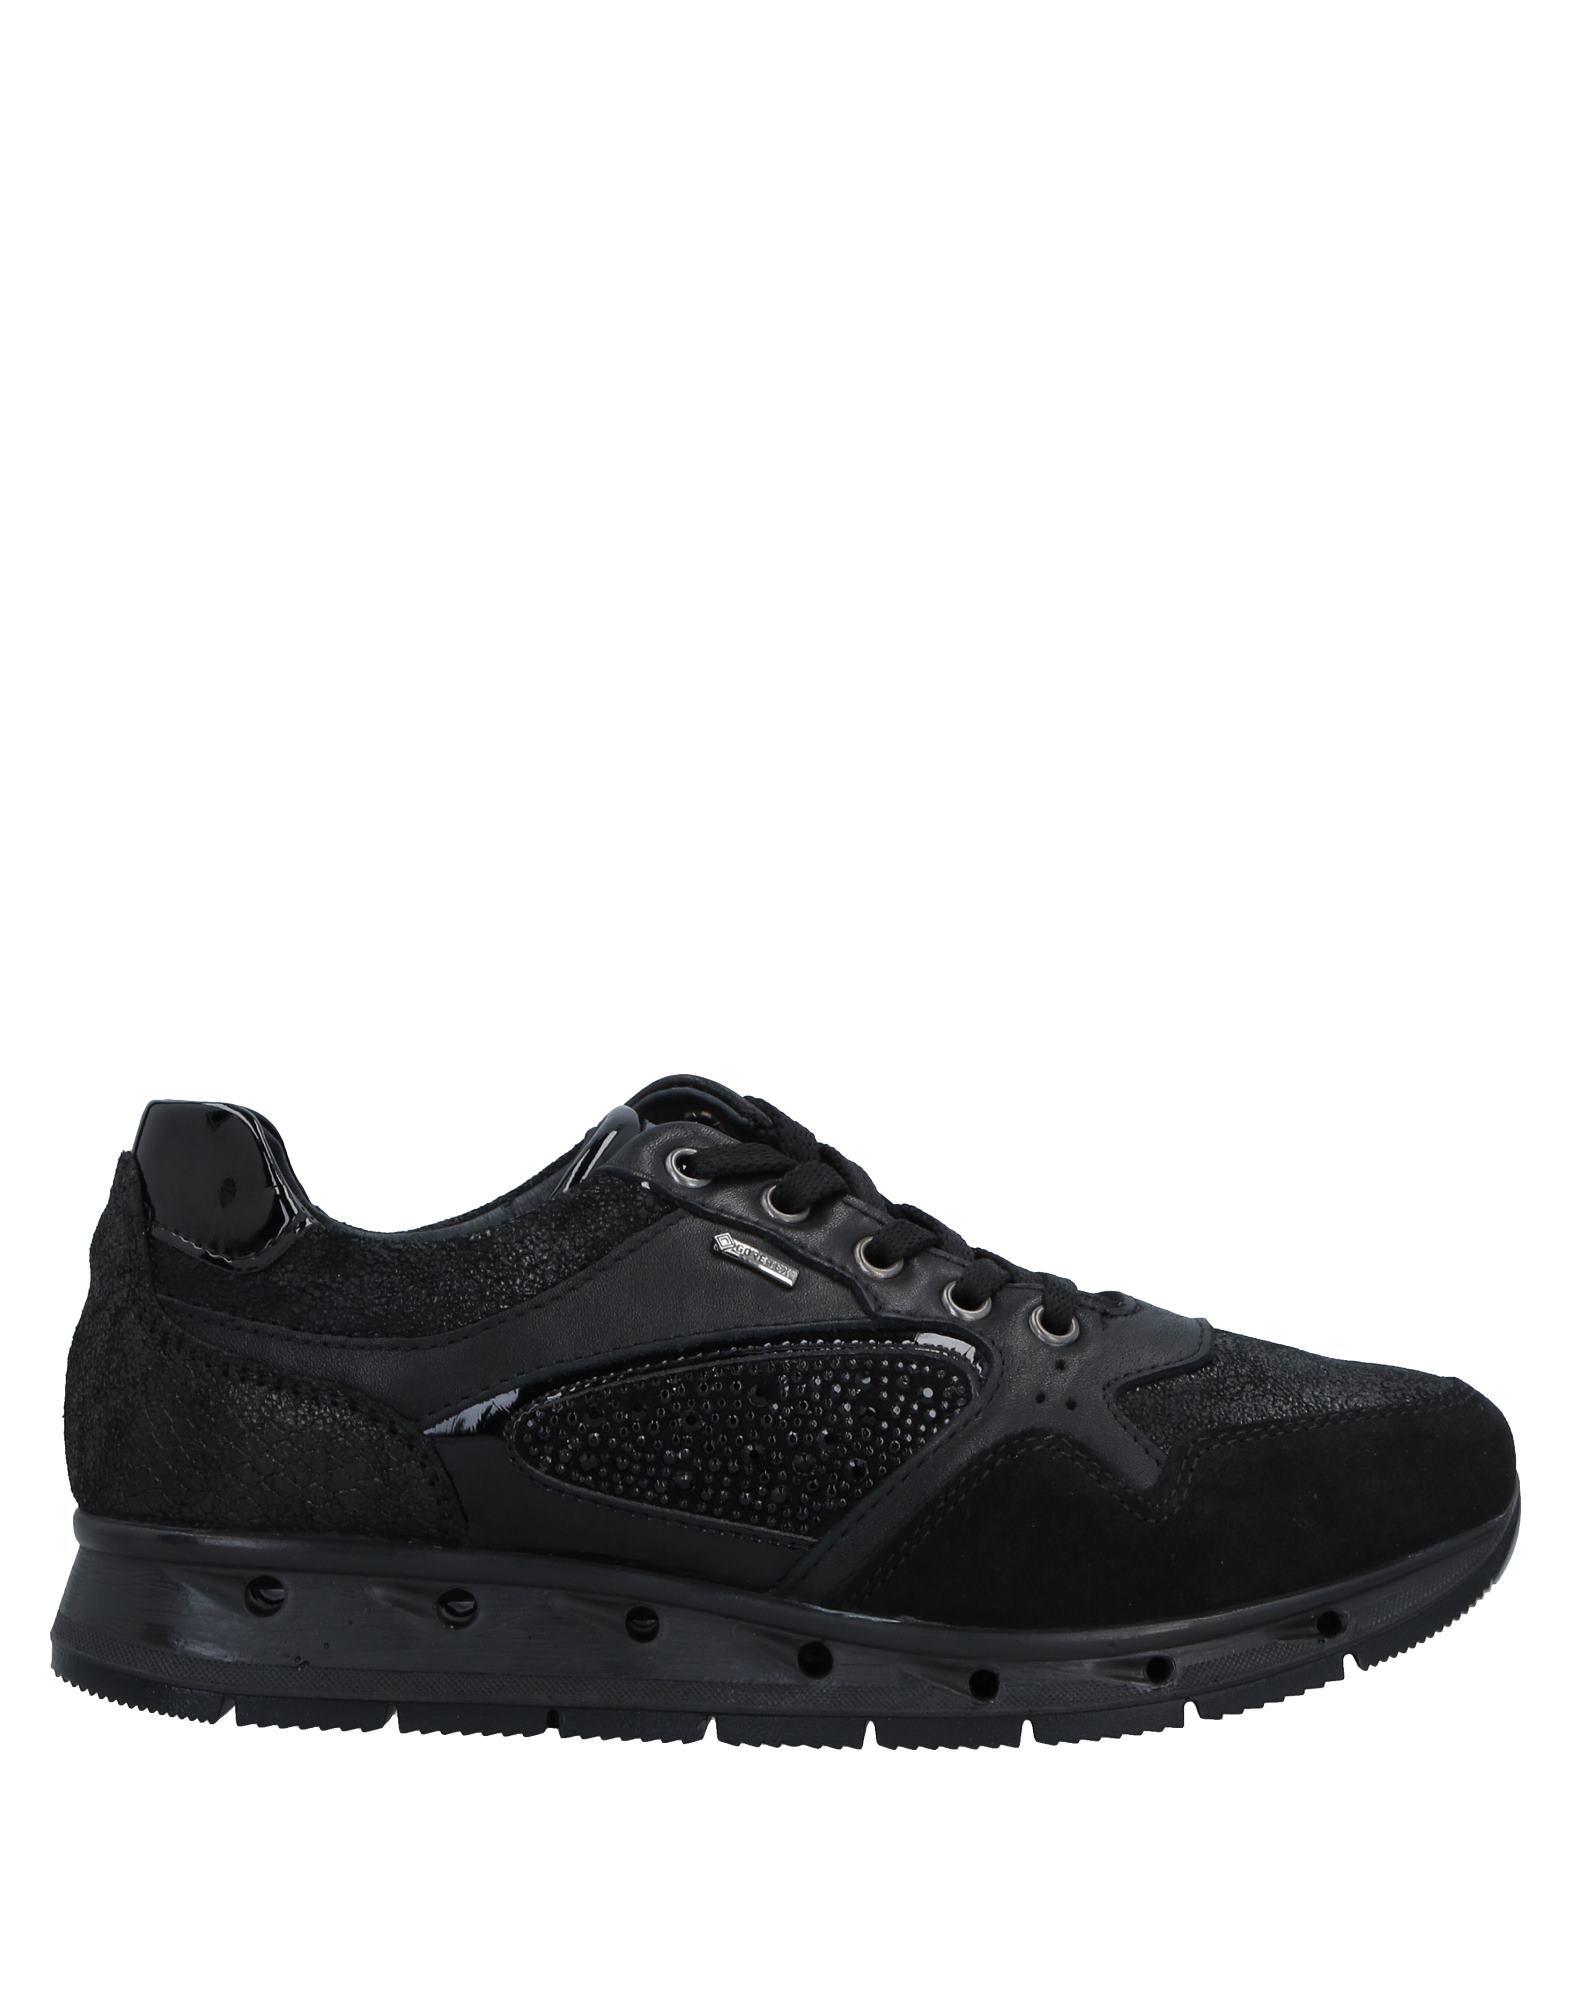 Sneakers Igi&Co Igi&Co Igi&Co Donna - 11534961AB 58f53f